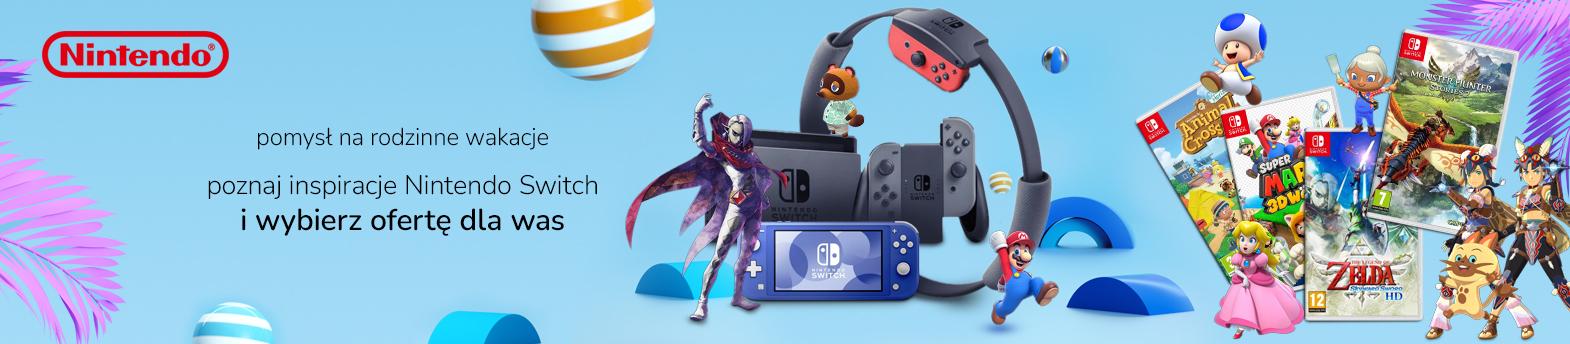 Nintendo na wakacje